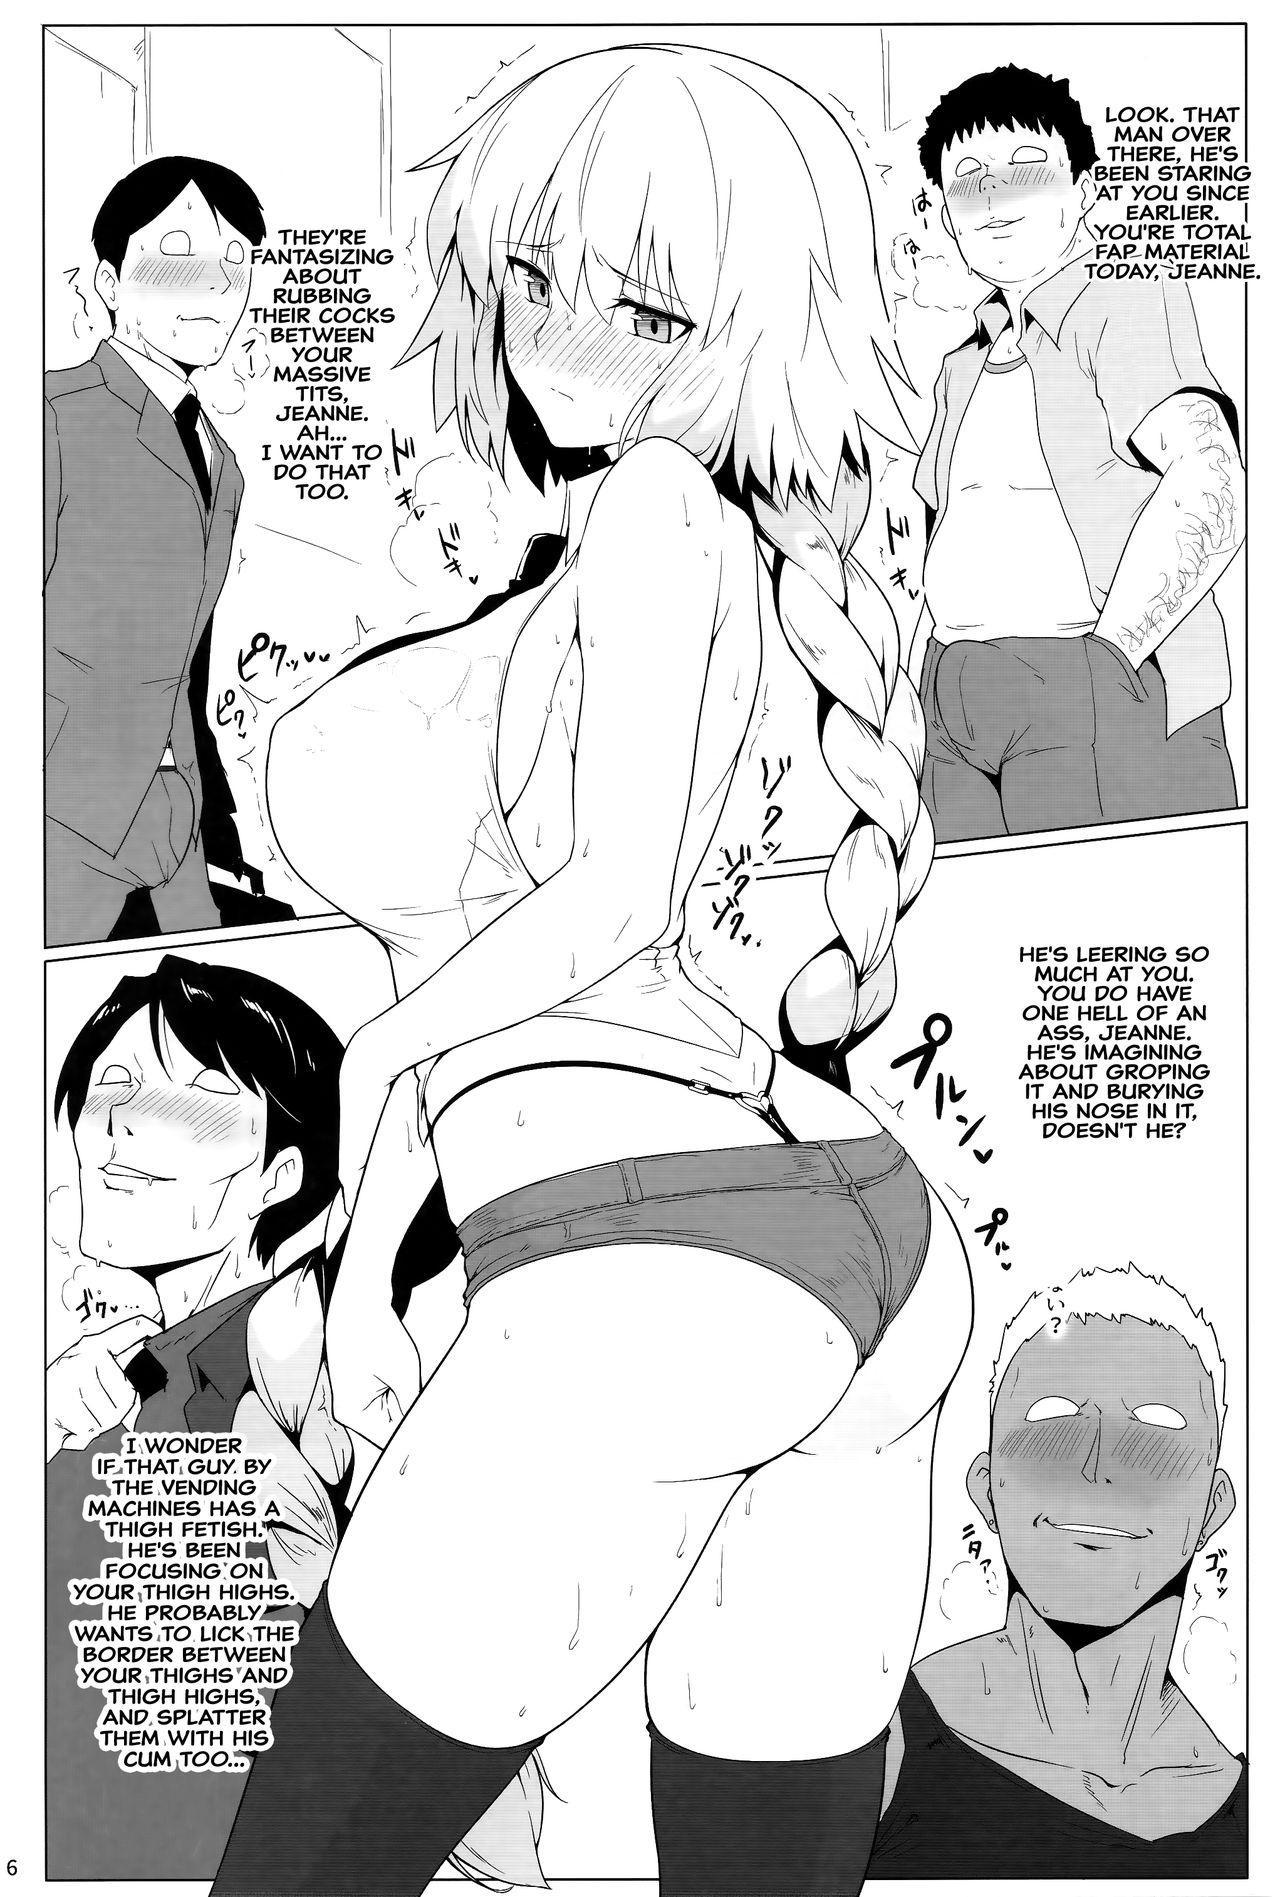 Chaldea Shiko Shiko Material Vol. 2   Chaldea Fap Material Vol. 2 4